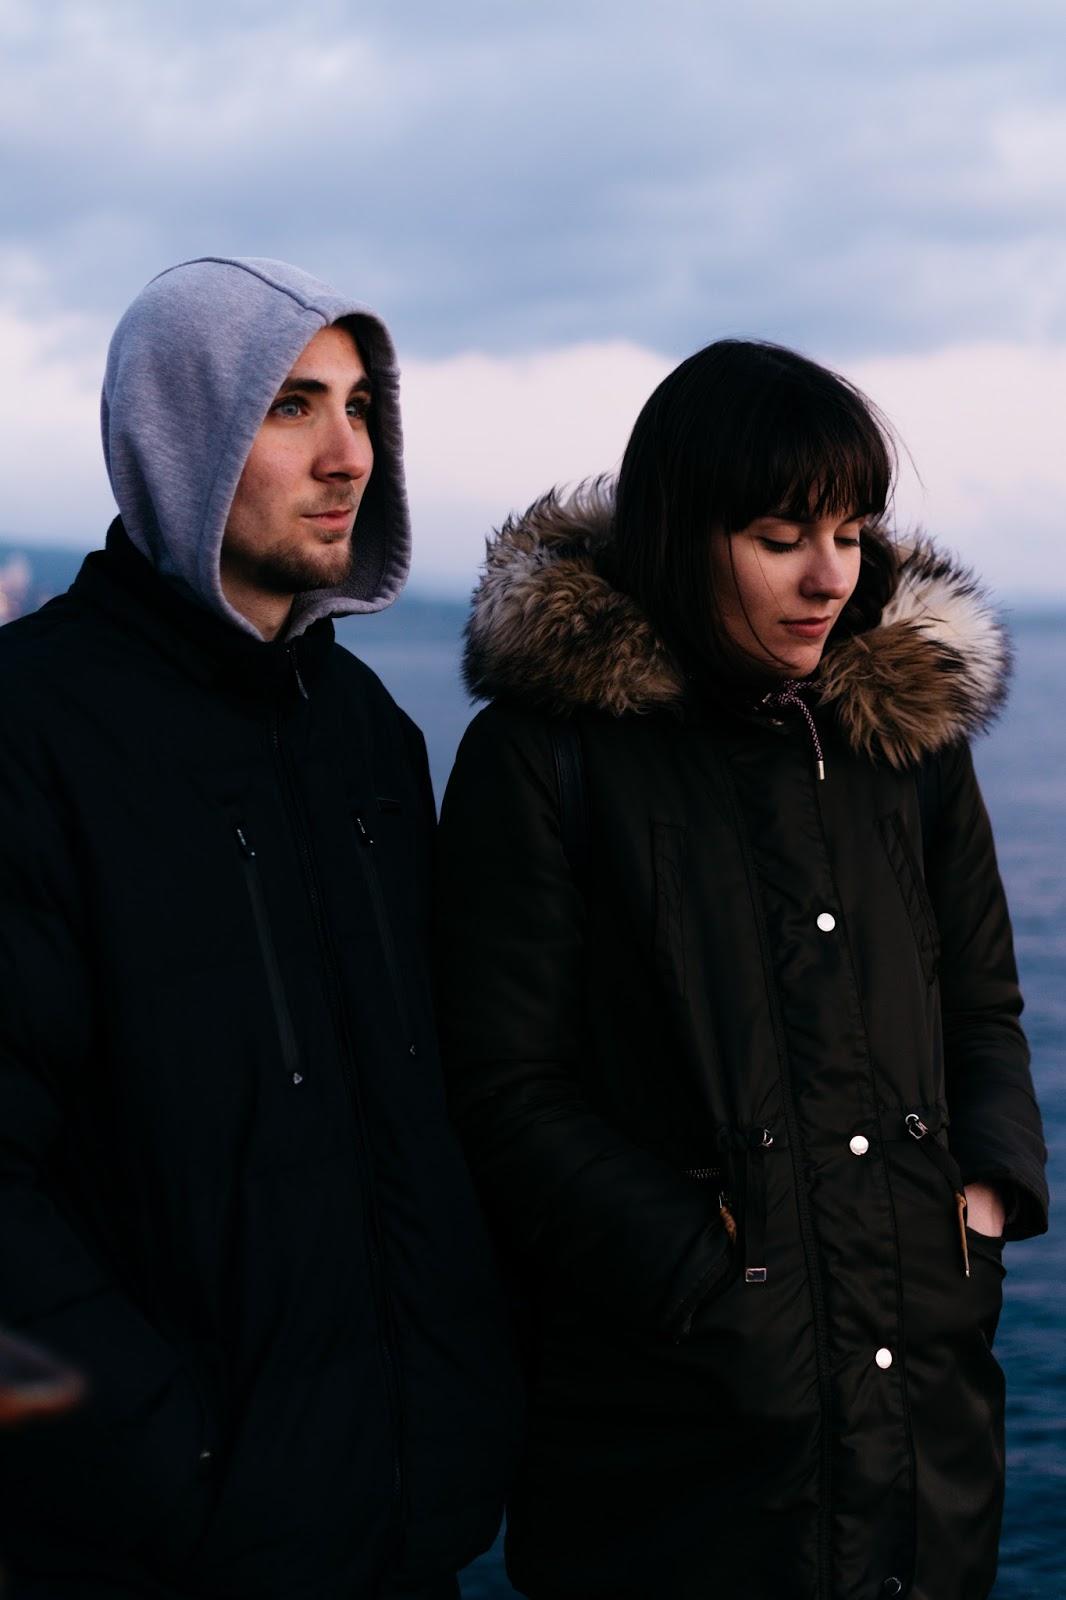 Mladen & Ana by Moonshinefaerie